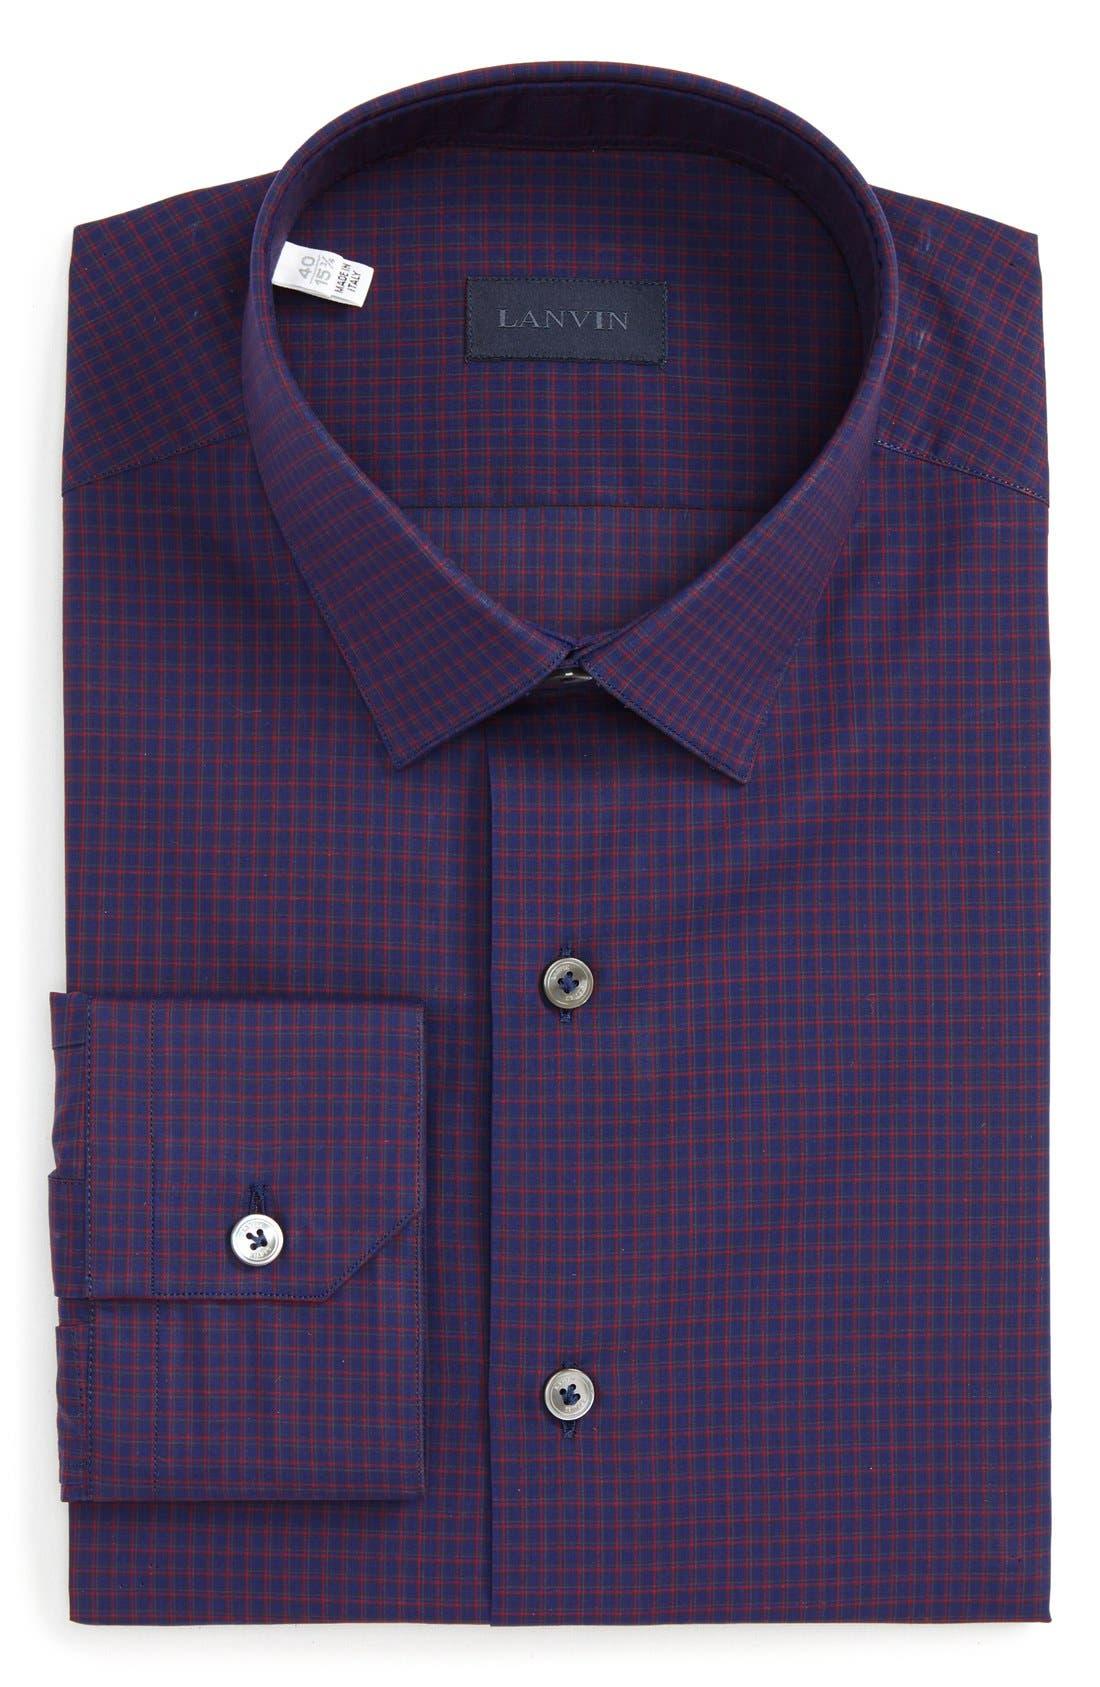 Lanvin Trim Fit Check Dress Shirt